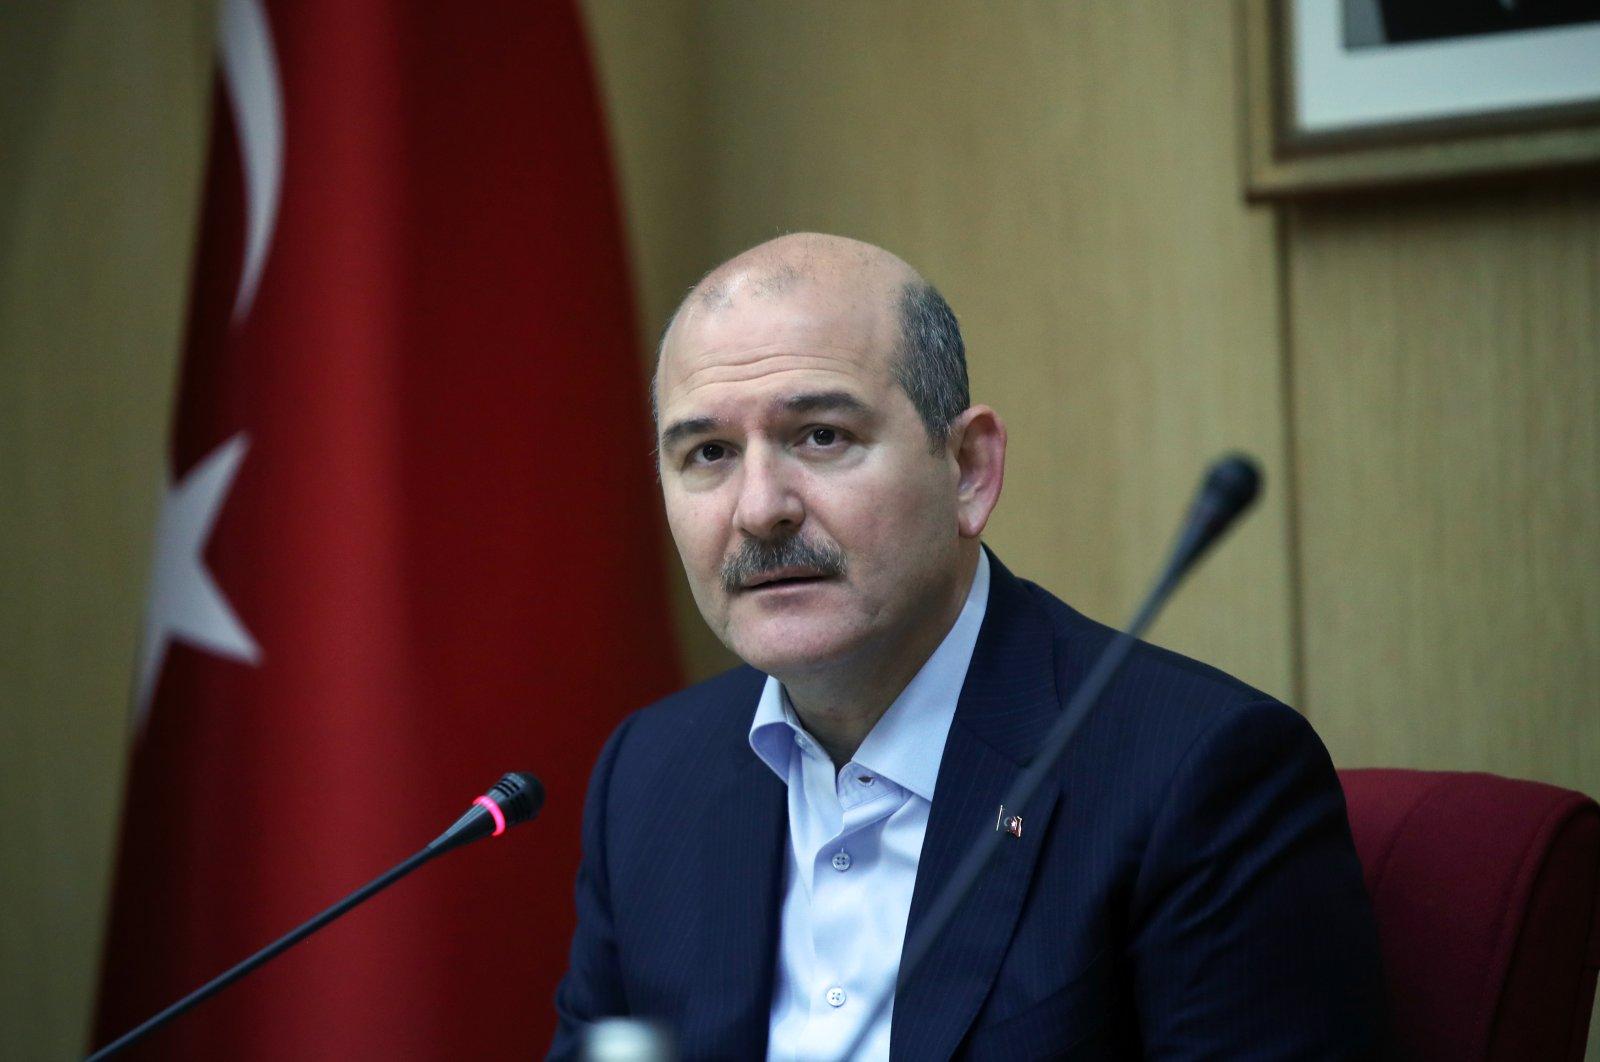 Interior Minister Süleyman Soylu speaks at a news conference in Ankara, Turkey, April 12, 2020. (AA Photo)